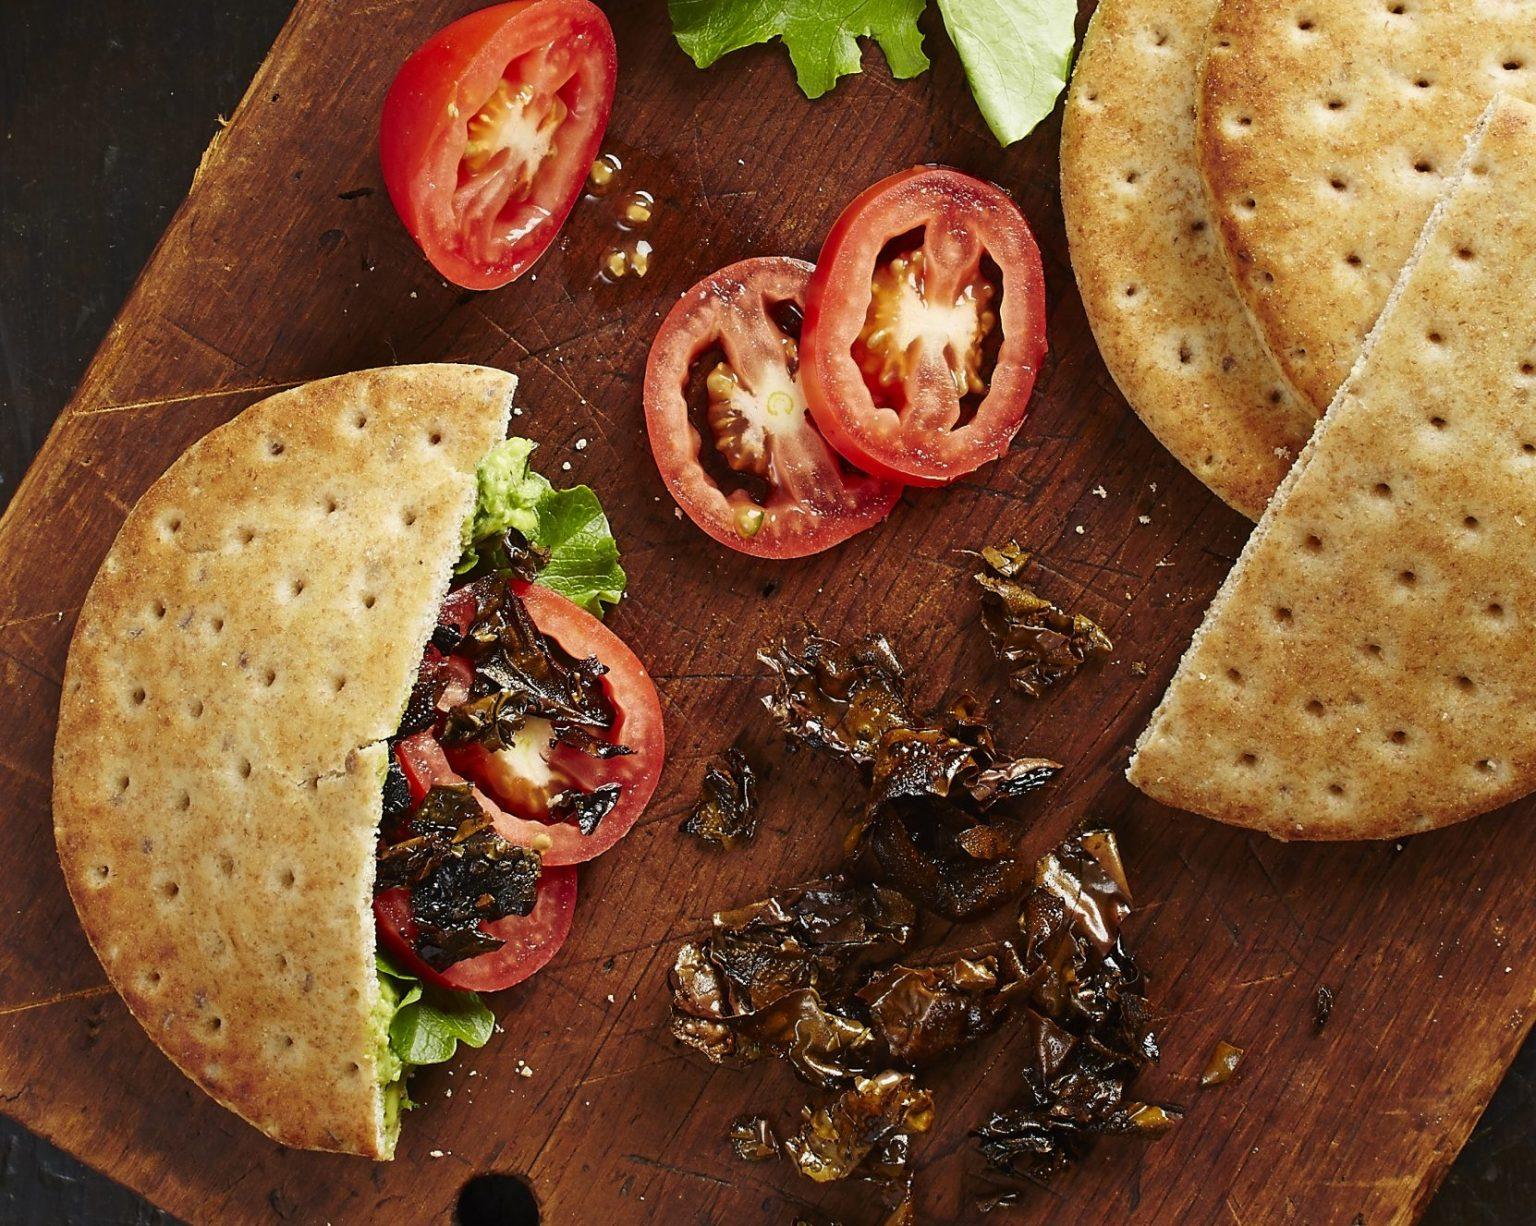 Vegan BLAT (Bacon, Lettuce, Avocado & Tomato) Pitas